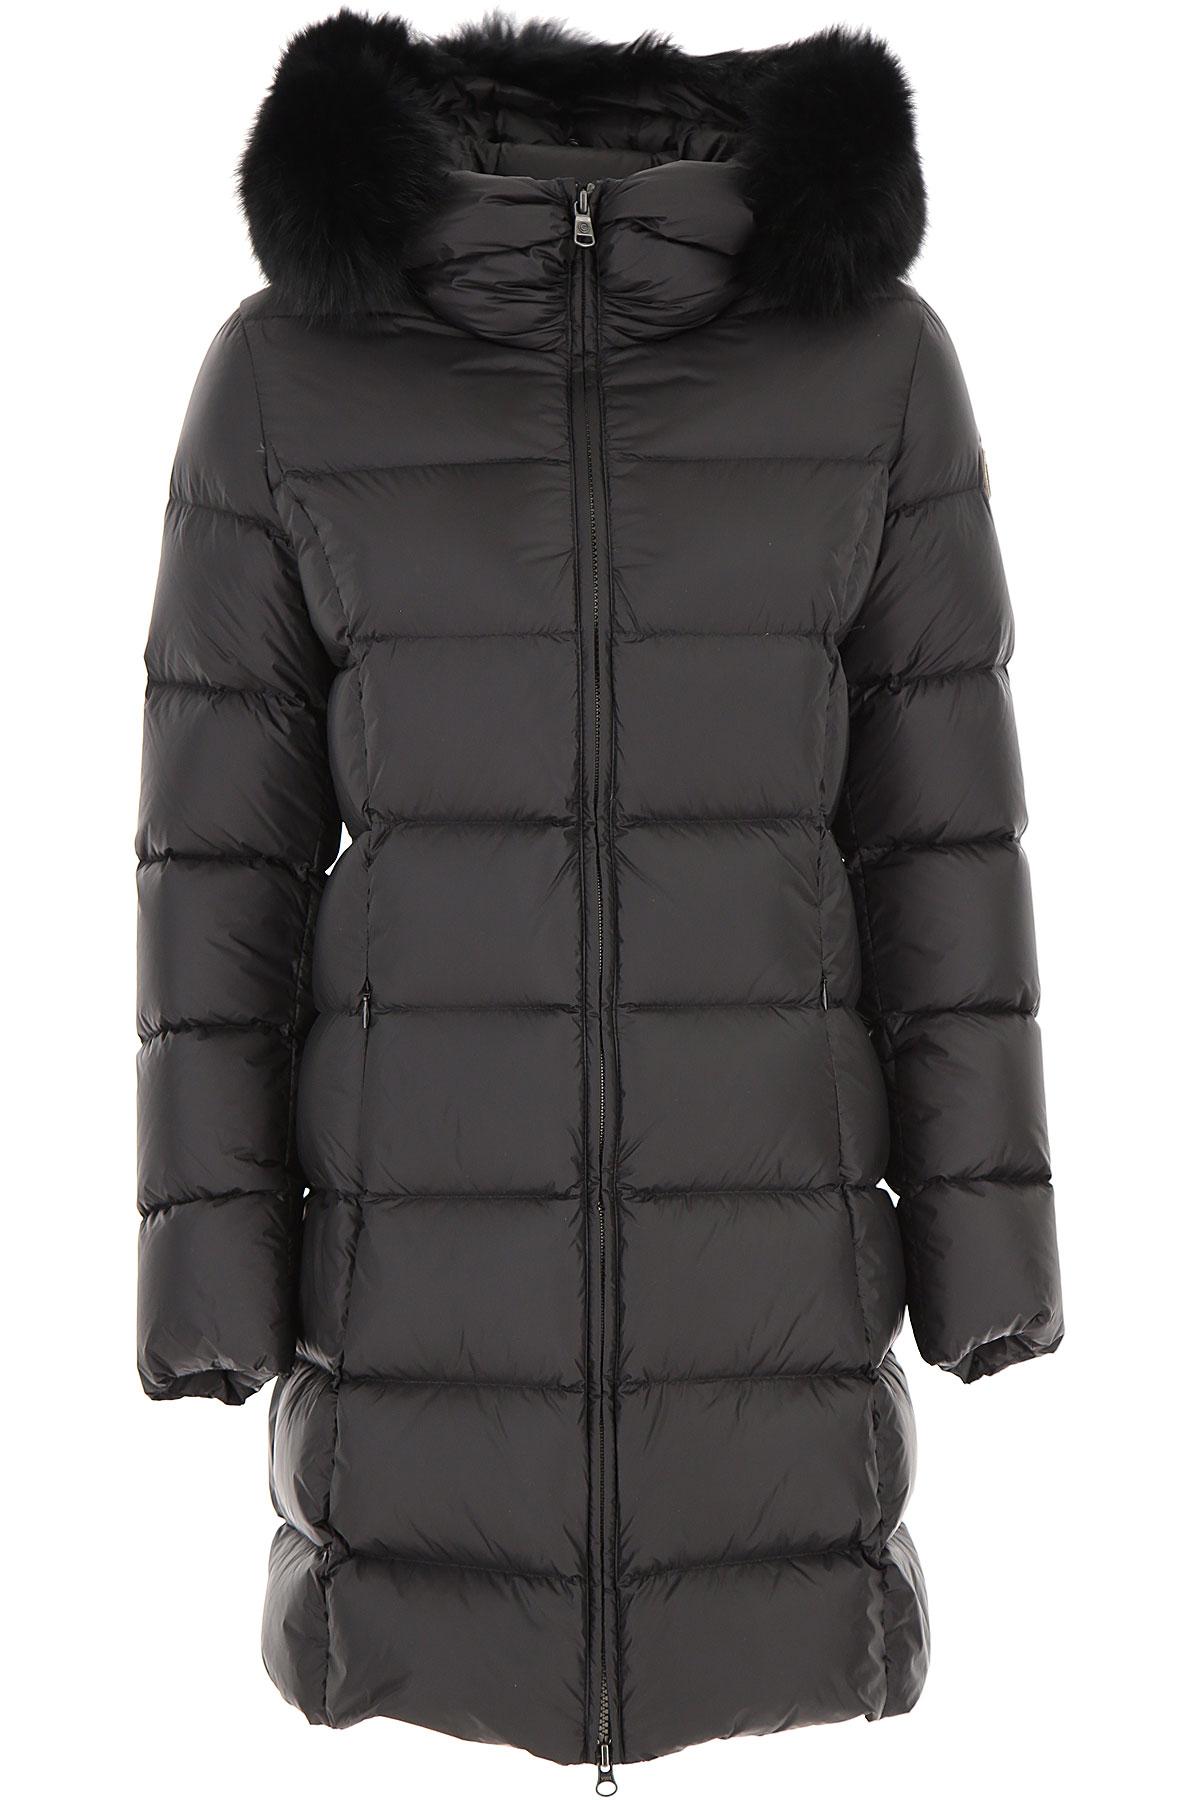 Colmar Down Jacket for Women, Puffer Ski Jacket On Sale, Black, Down, 2019, 12 6 8